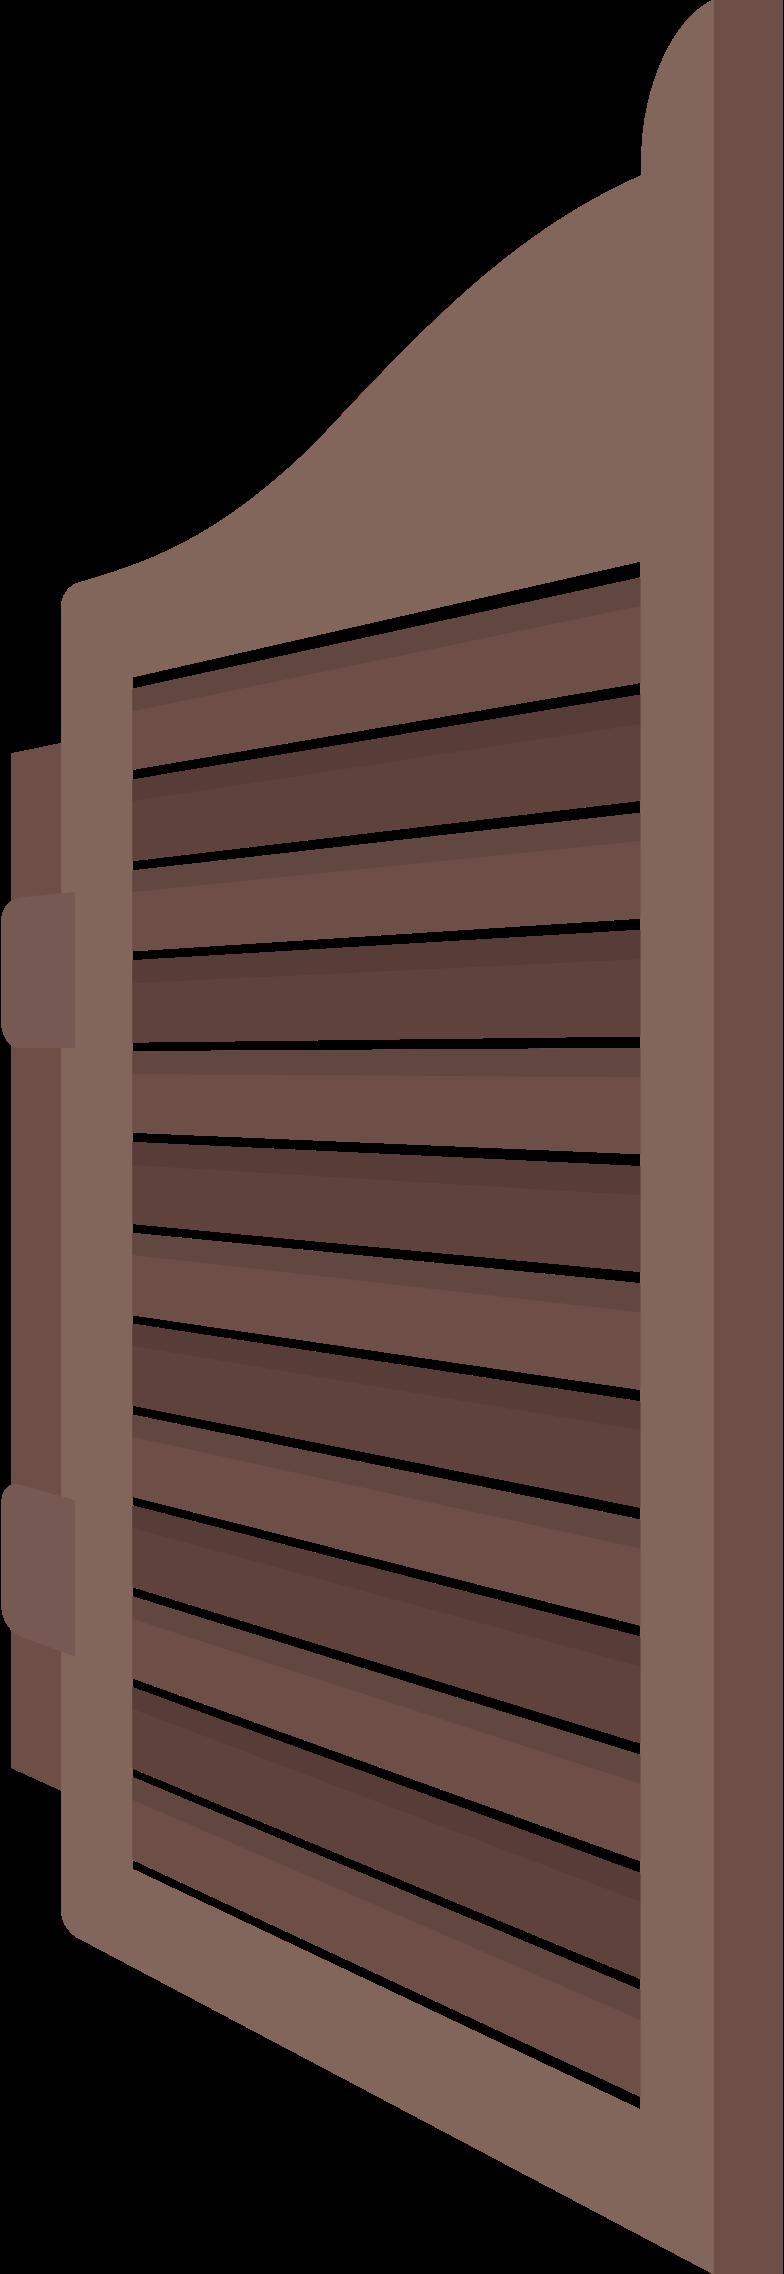 saloon-door-left Clipart illustration in PNG, SVG